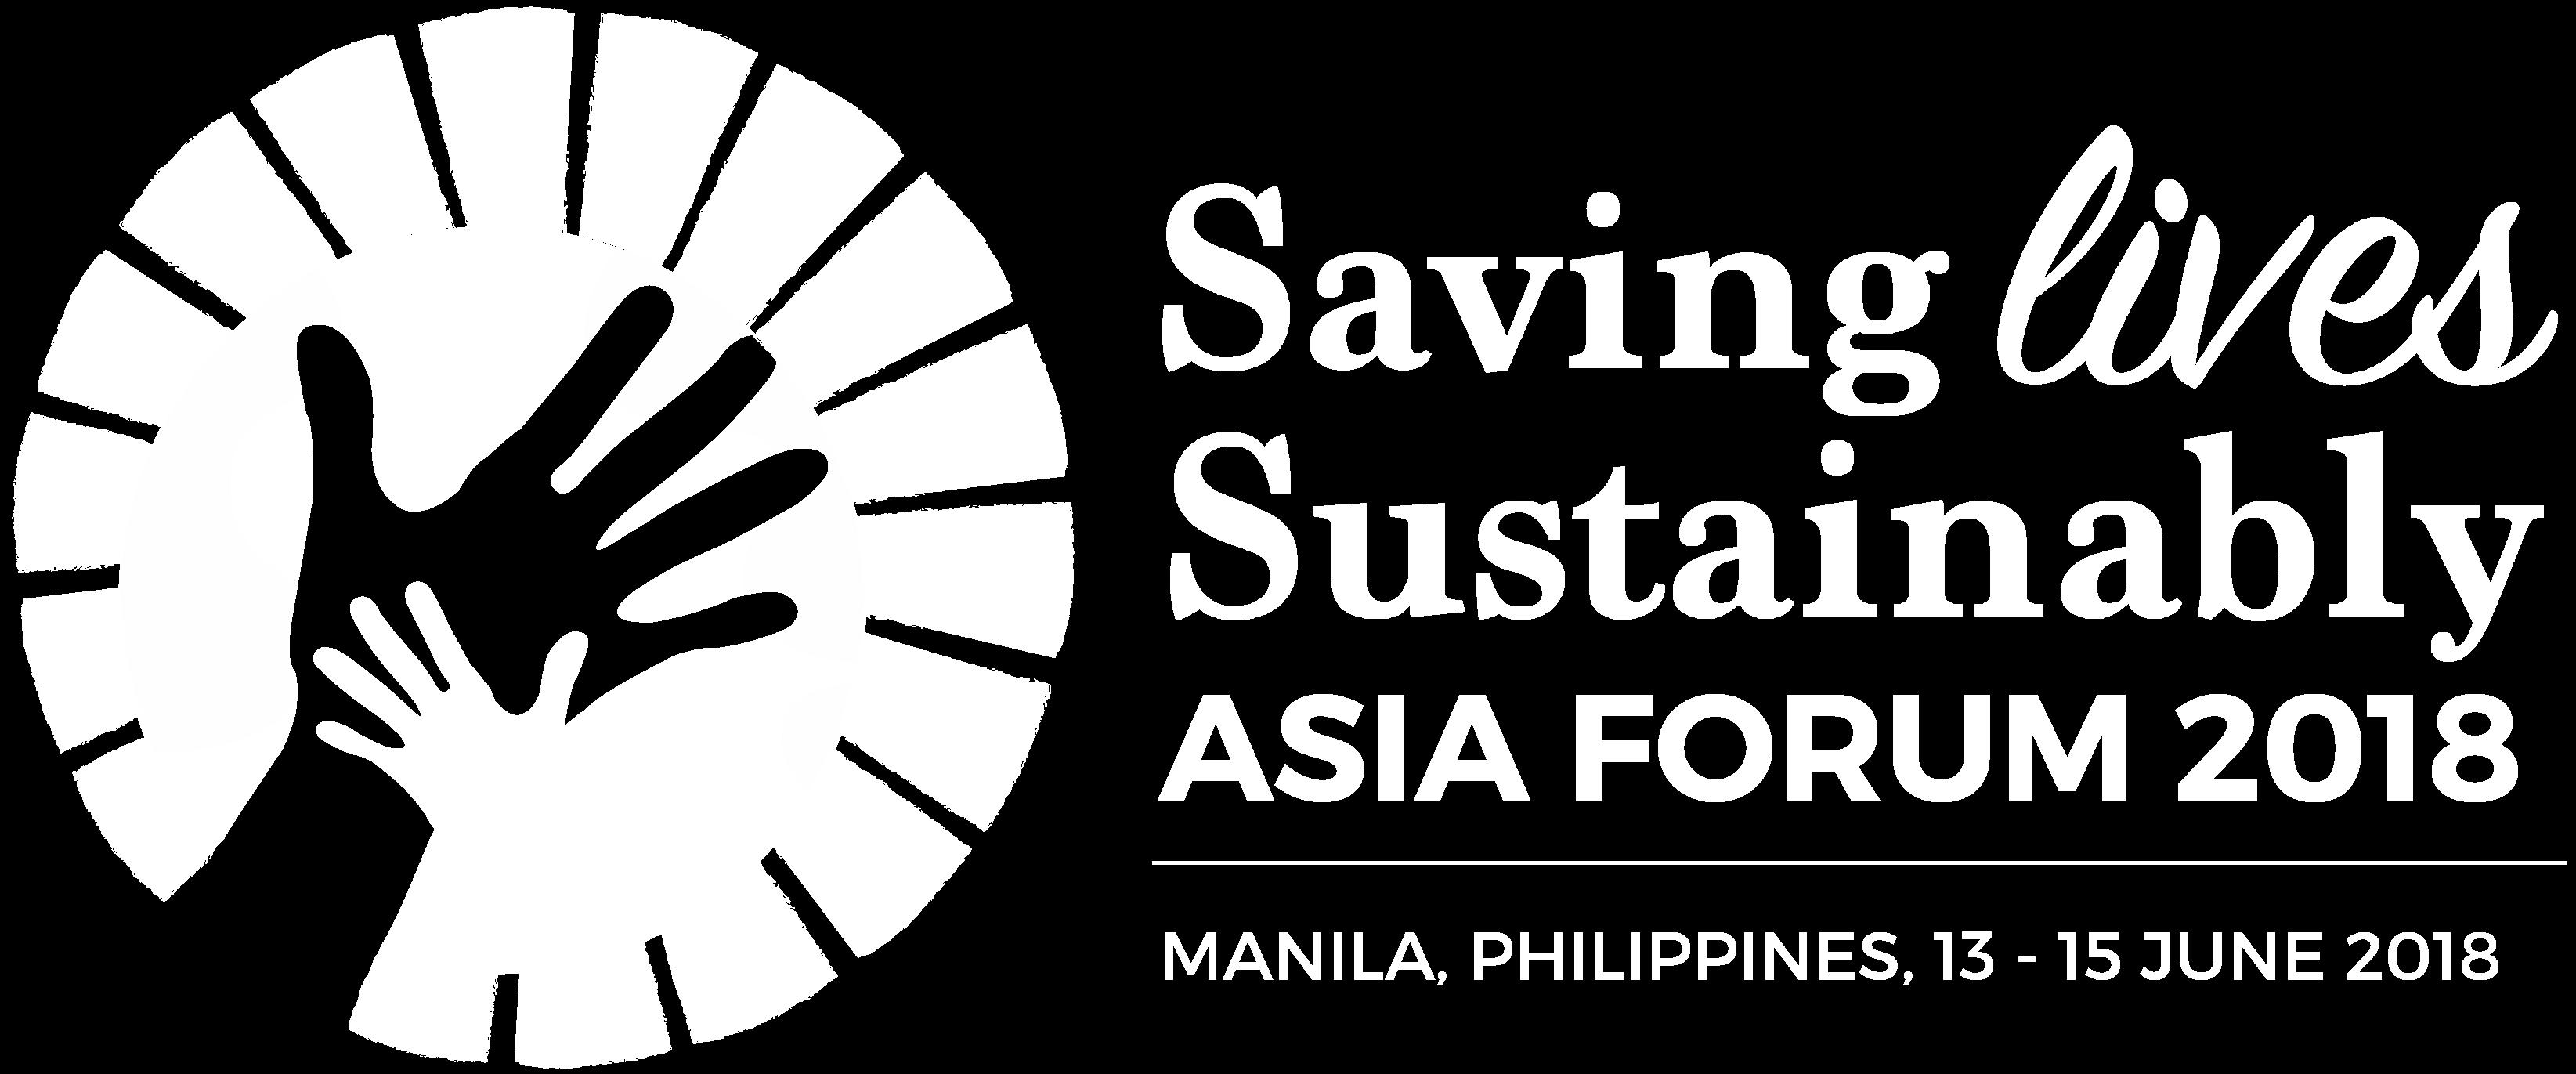 UN informal Interagency Task Team on Sustainable Procurement